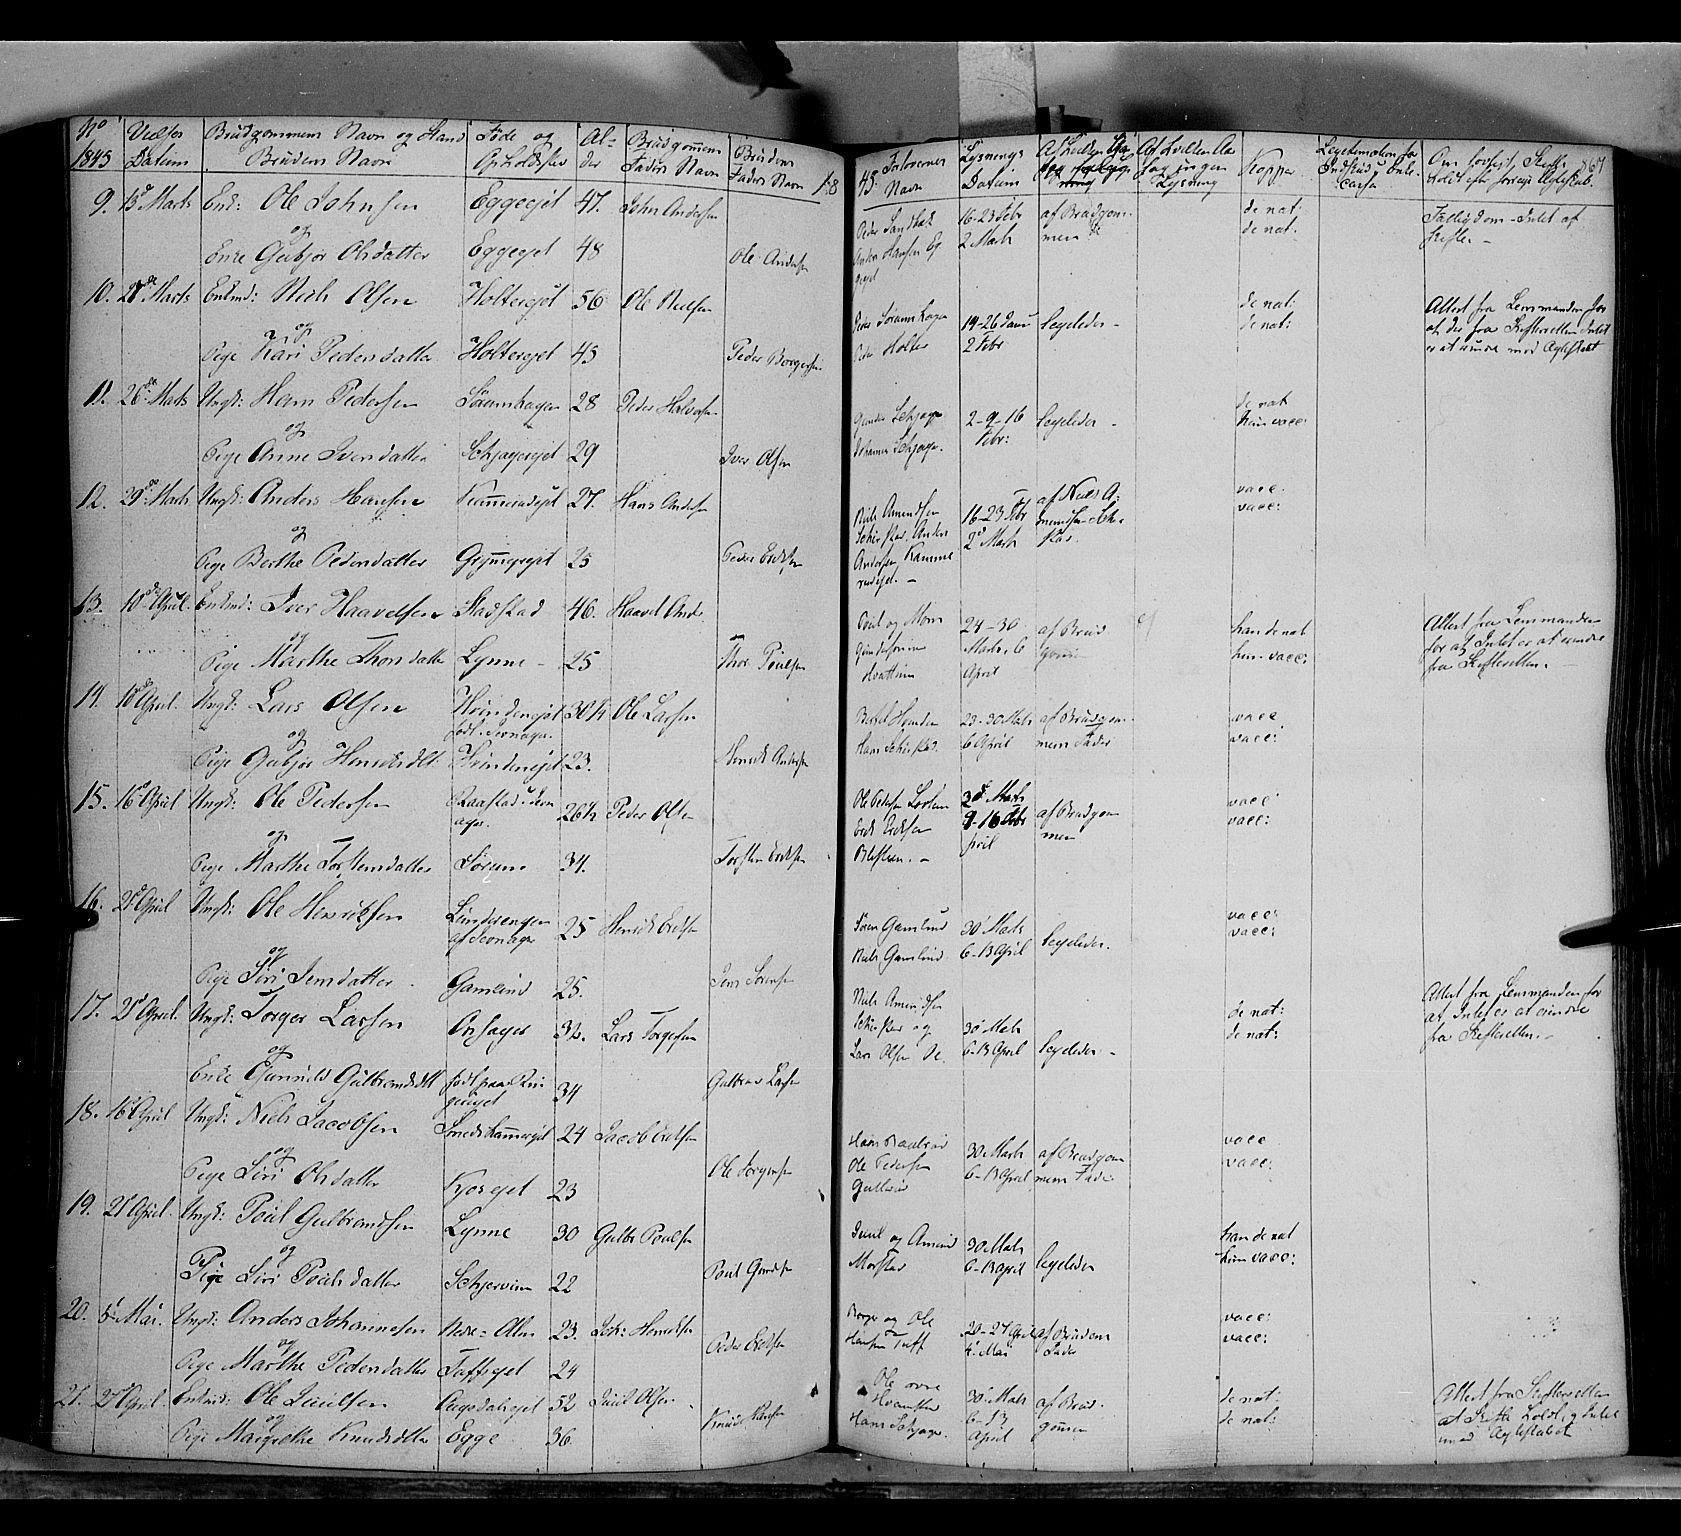 SAH, Gran prestekontor, Ministerialbok nr. 11, 1842-1856, s. 866-867